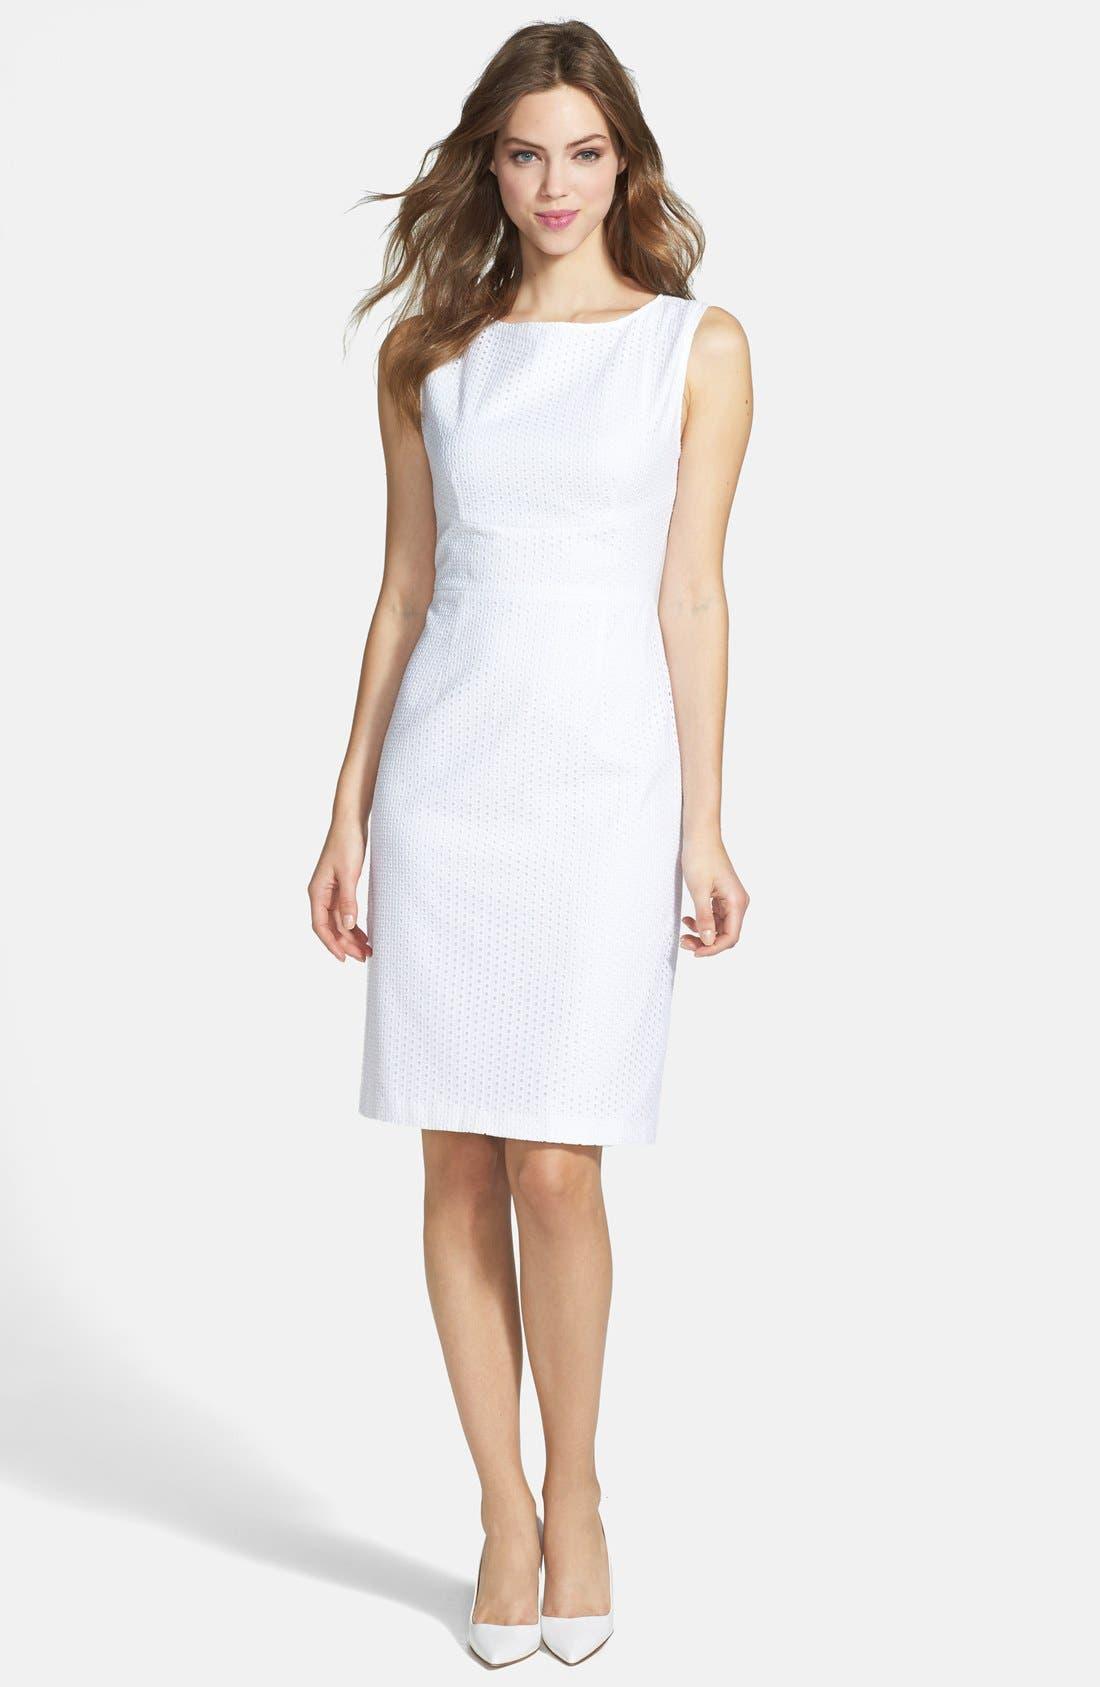 Alternate Image 1 Selected - T Tahari 'Myra' Peplum Sheath Dress